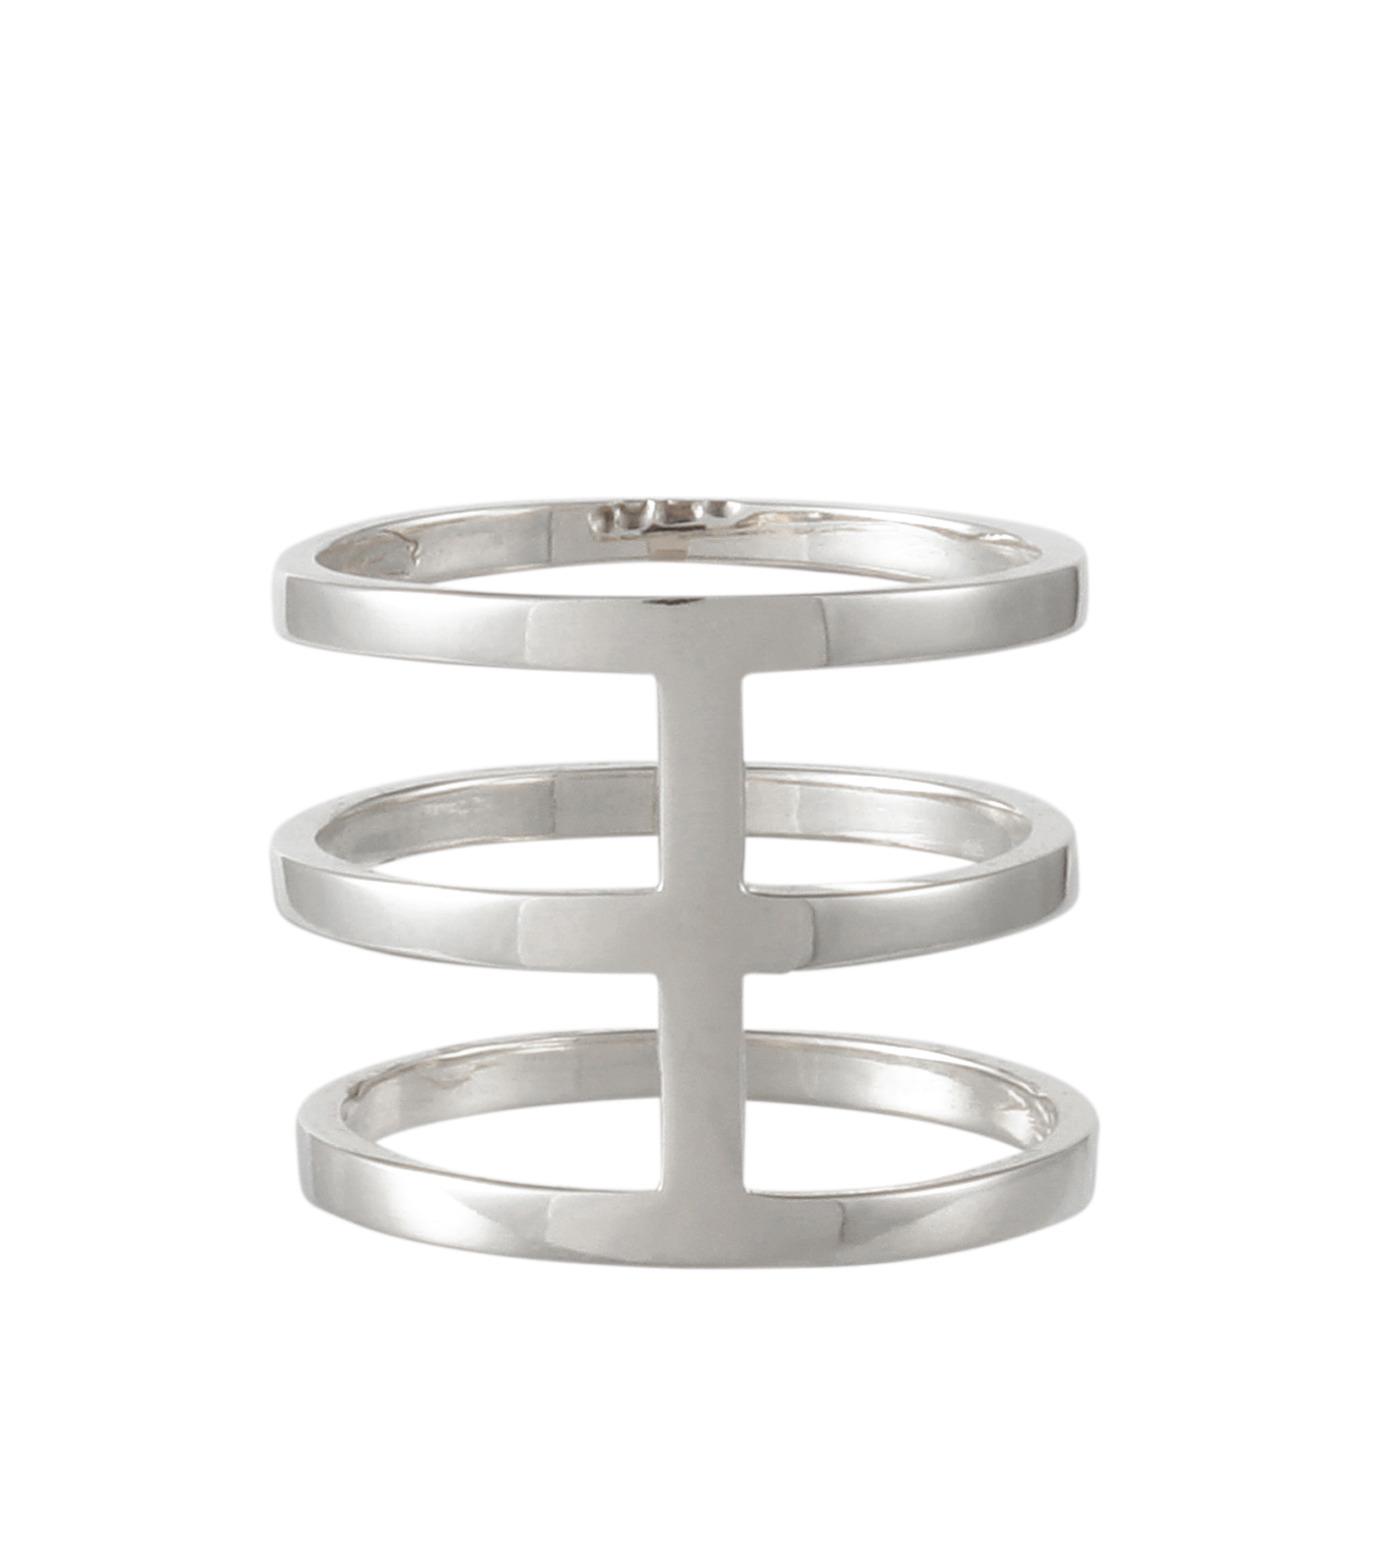 Campbell(キャンベル)のTribar Ring-SILVER(アクセサリー/accessory)-TRIBAR-RING-1 拡大詳細画像3